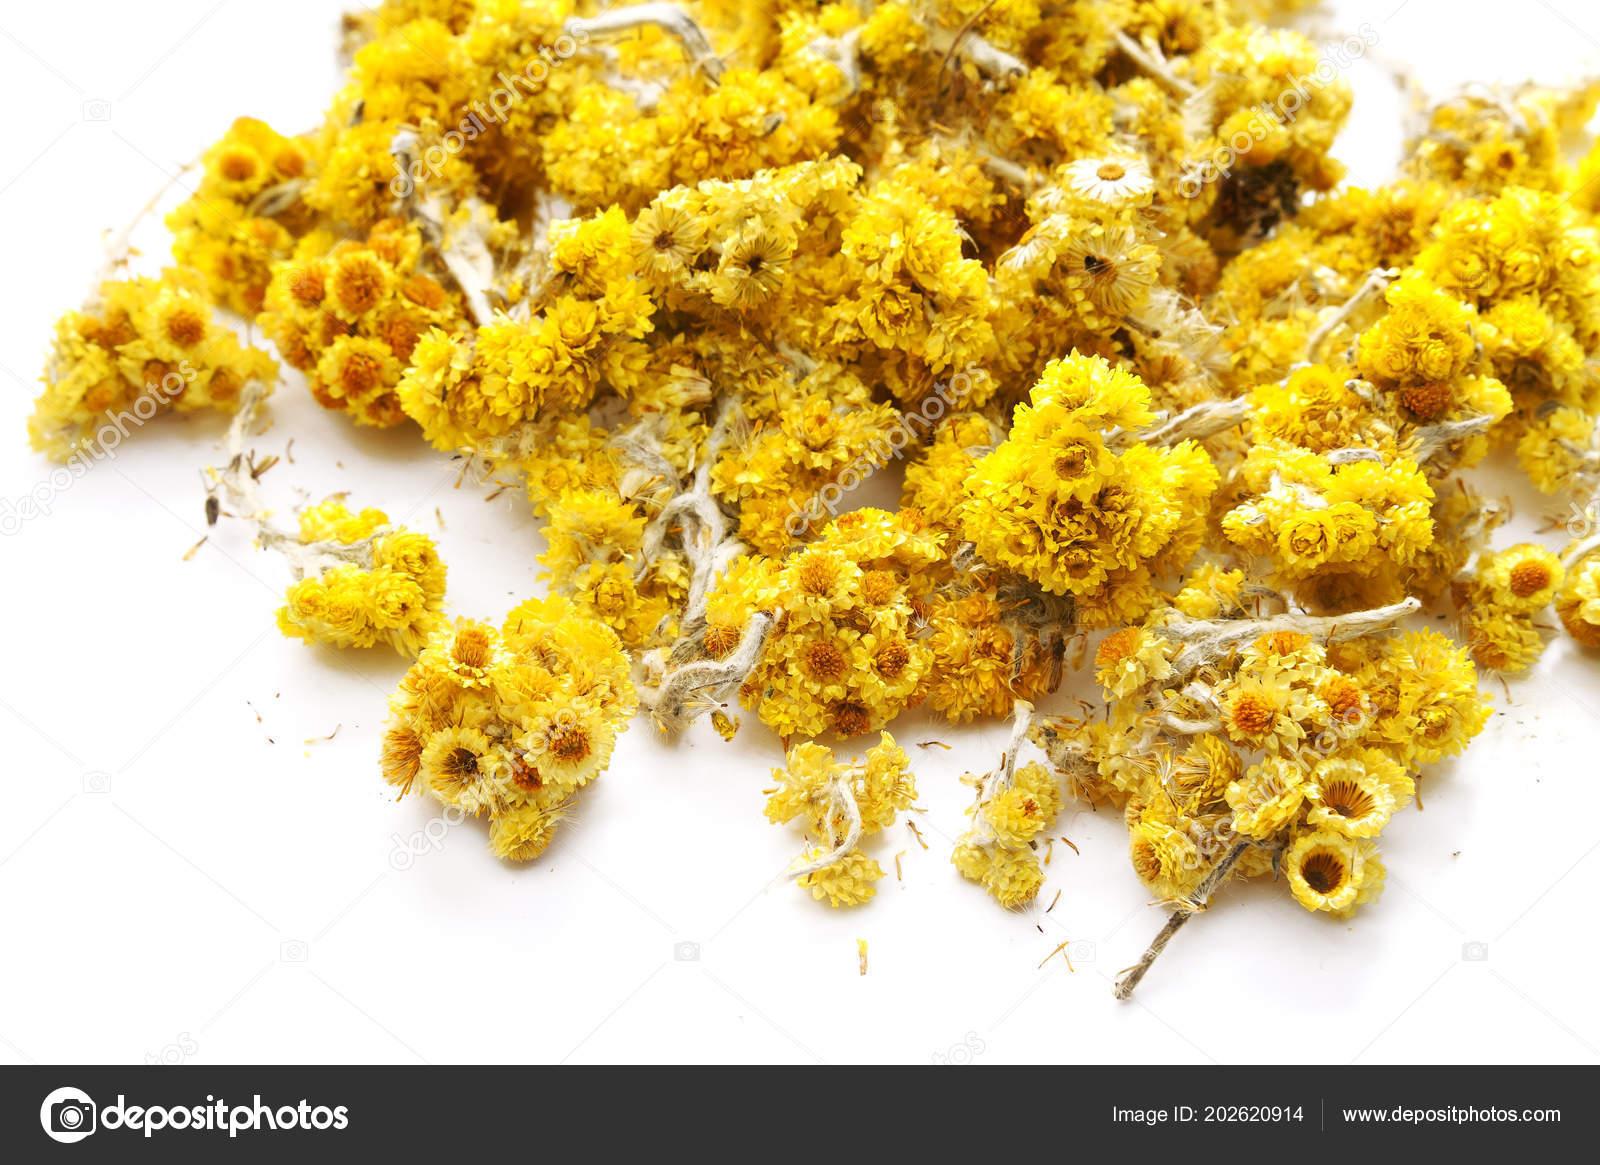 Immortelle Dried Flowers Flowers Healthy